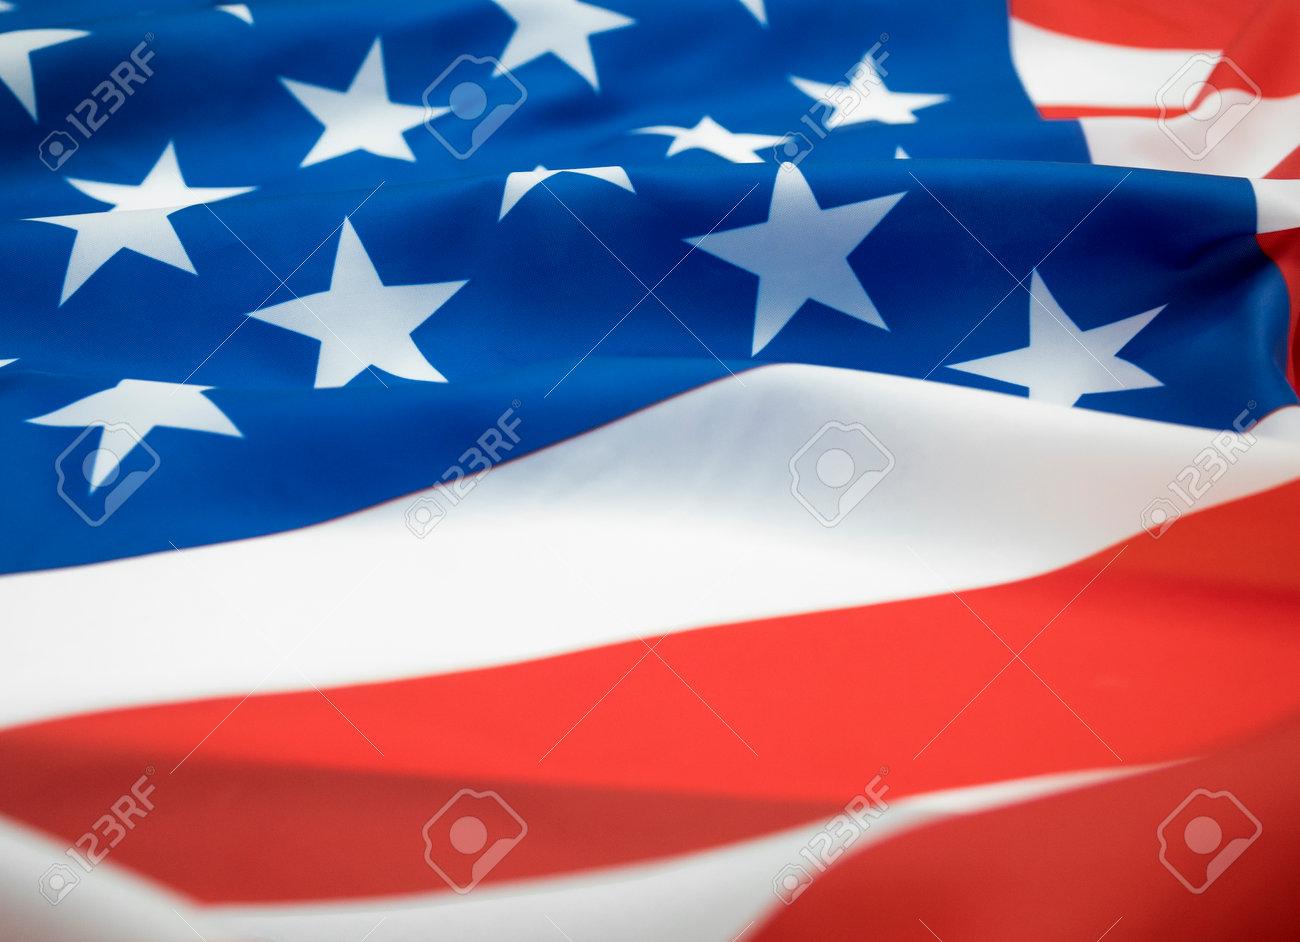 Close up waving of American flag. - 170462145